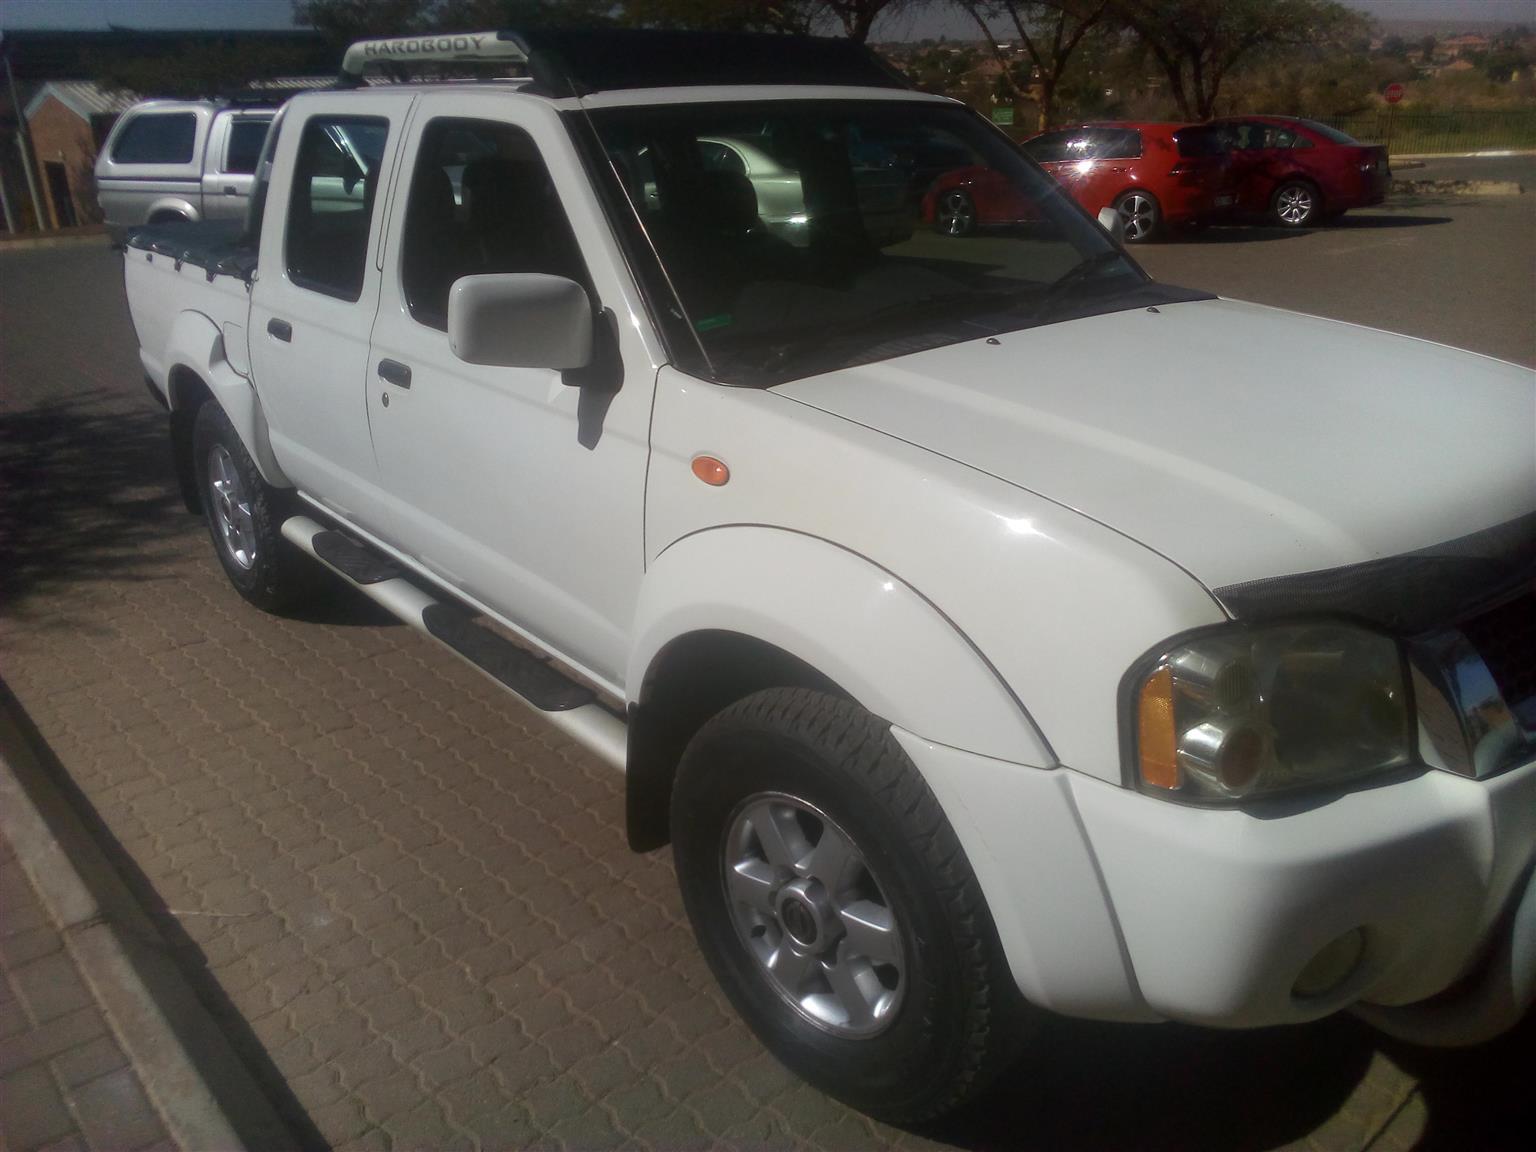 2007 Nissan Hardbody 2 4 16V double cab 4x4 SE | Junk Mail